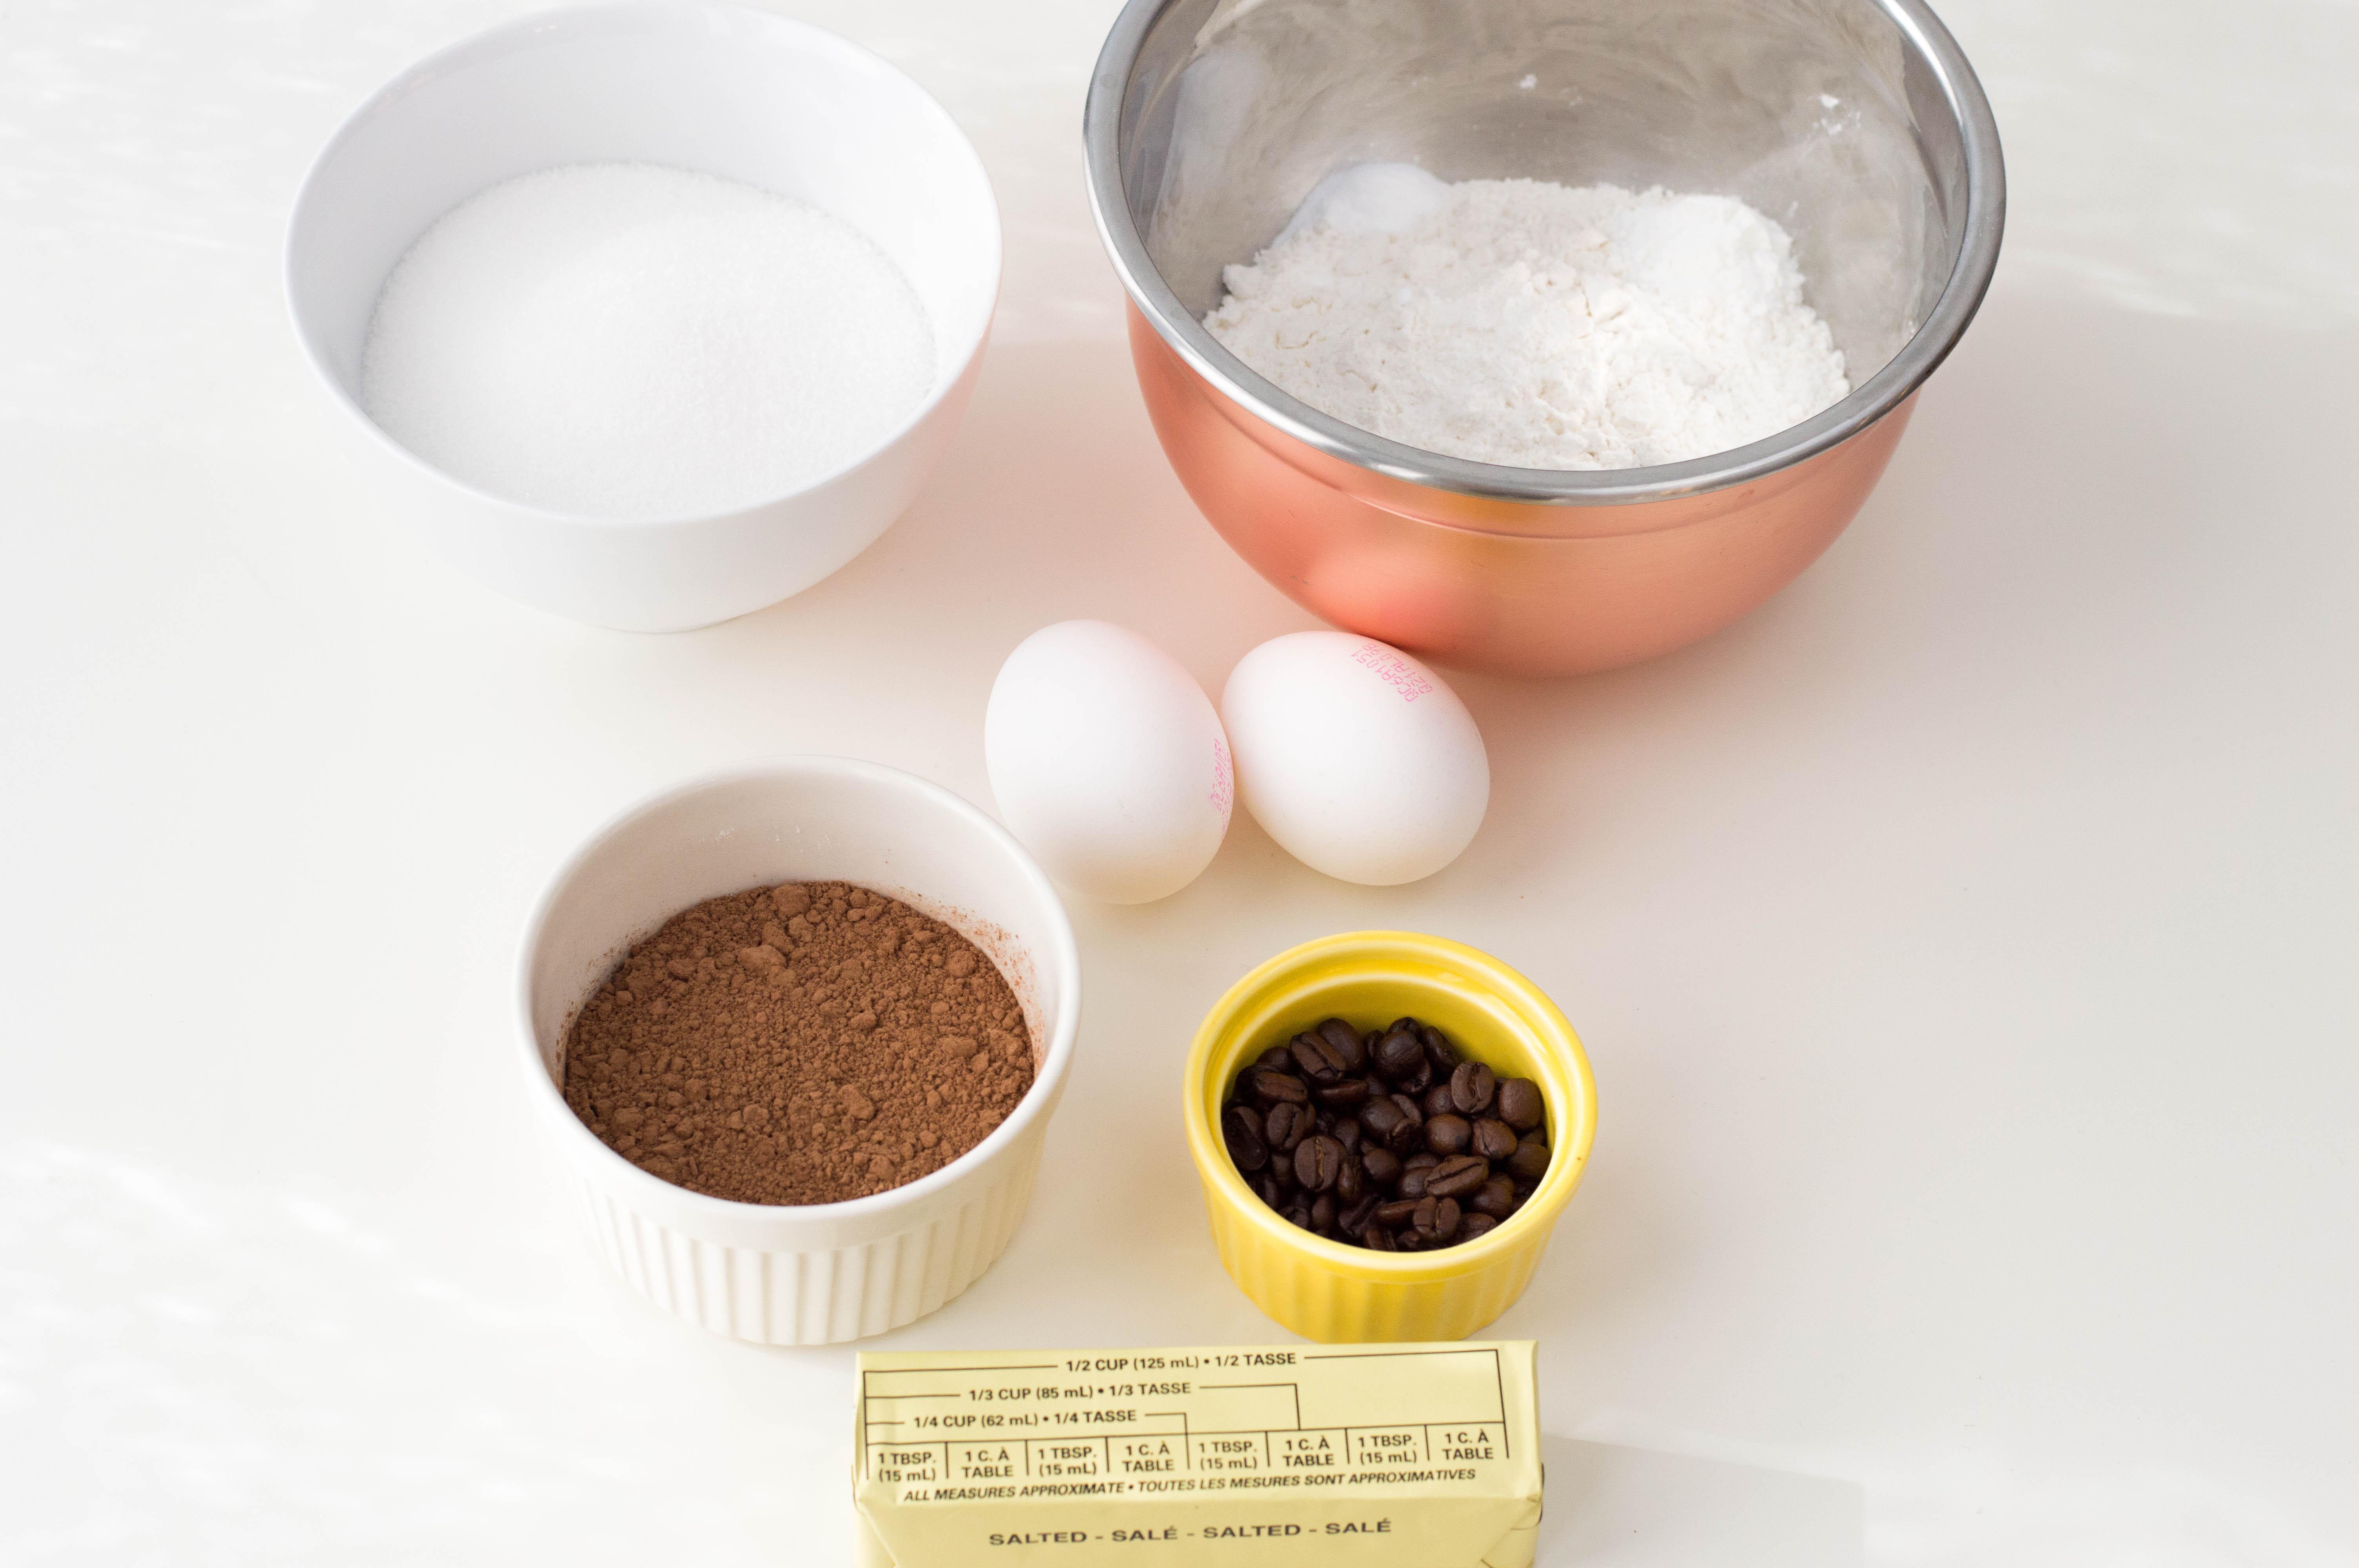 Mocha Cupcakes Ingredients